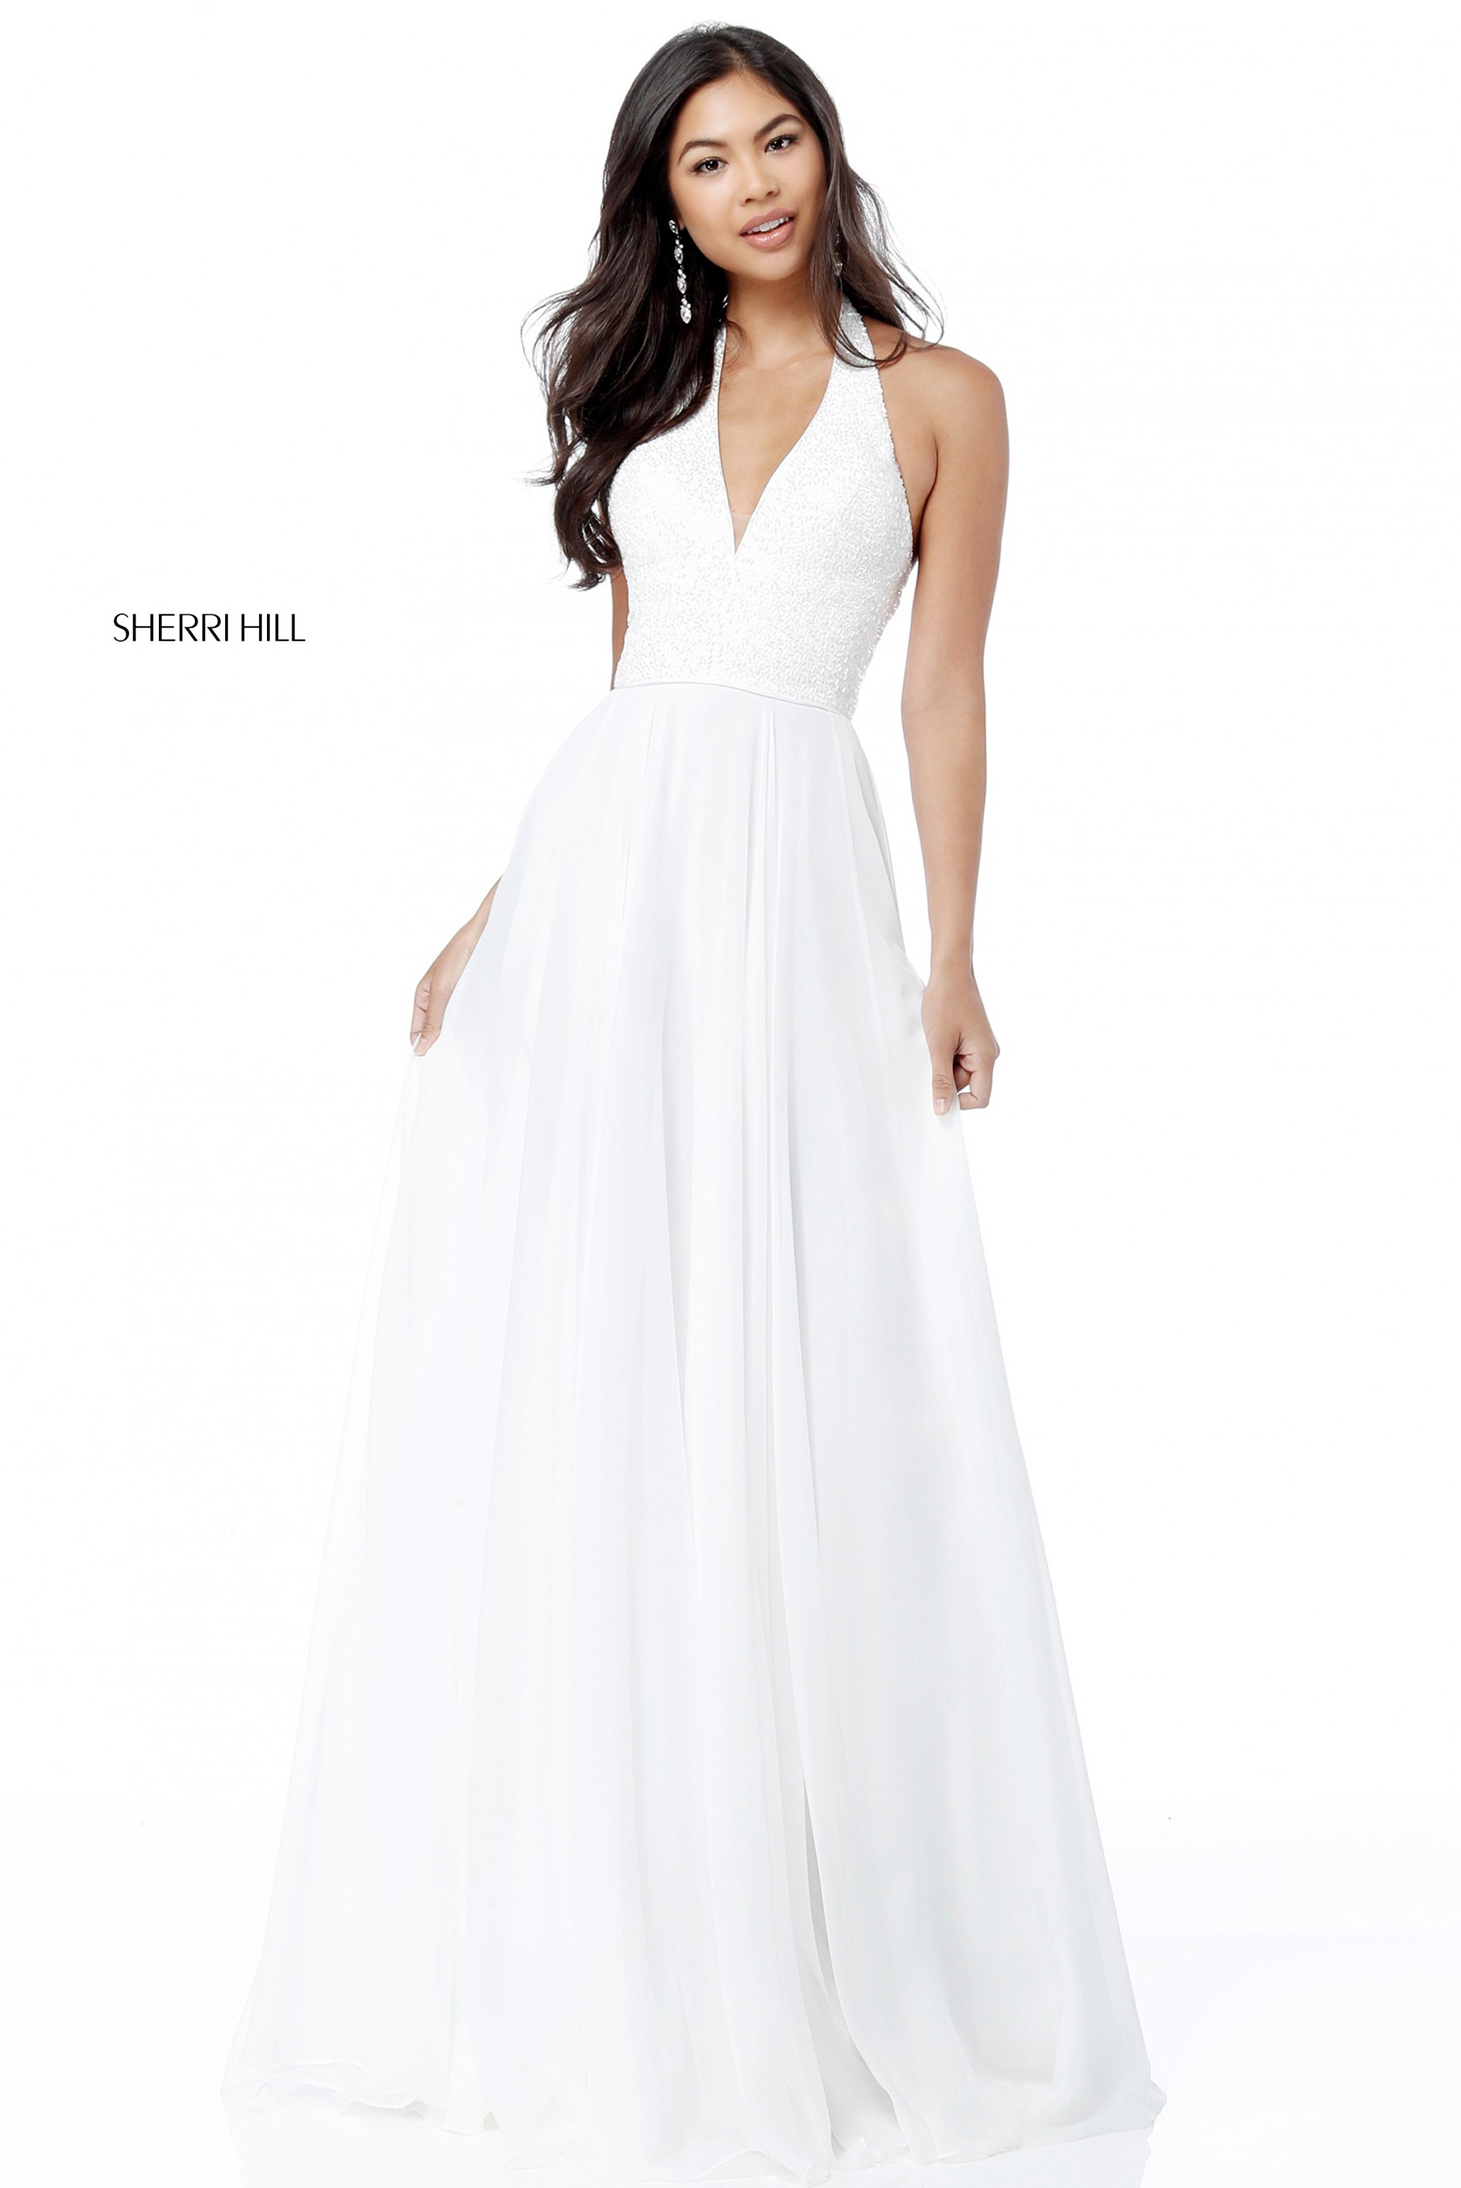 sherri-hill-51640-white-dress-S033900-3-334282.jpg